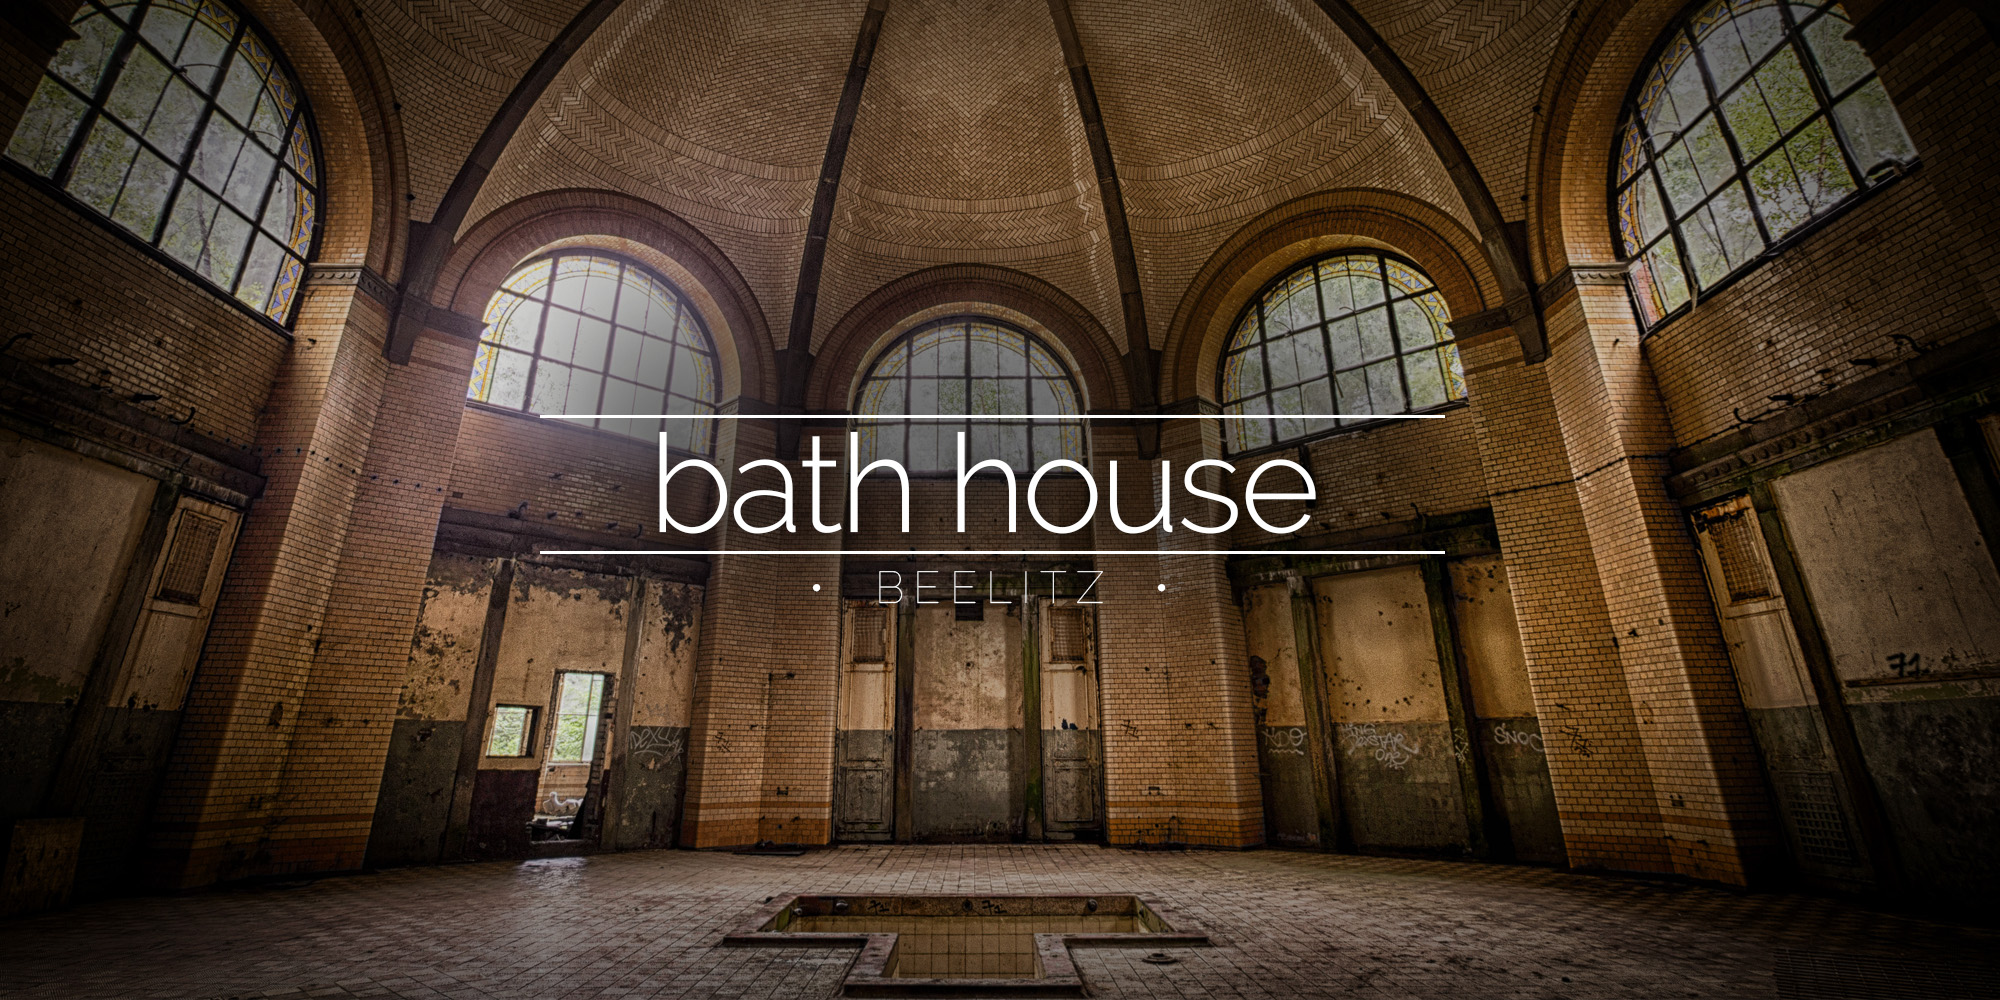 Amazing Mansions Beelitz Heilst 228 Tten Central Bath House Germany 187 Urbex